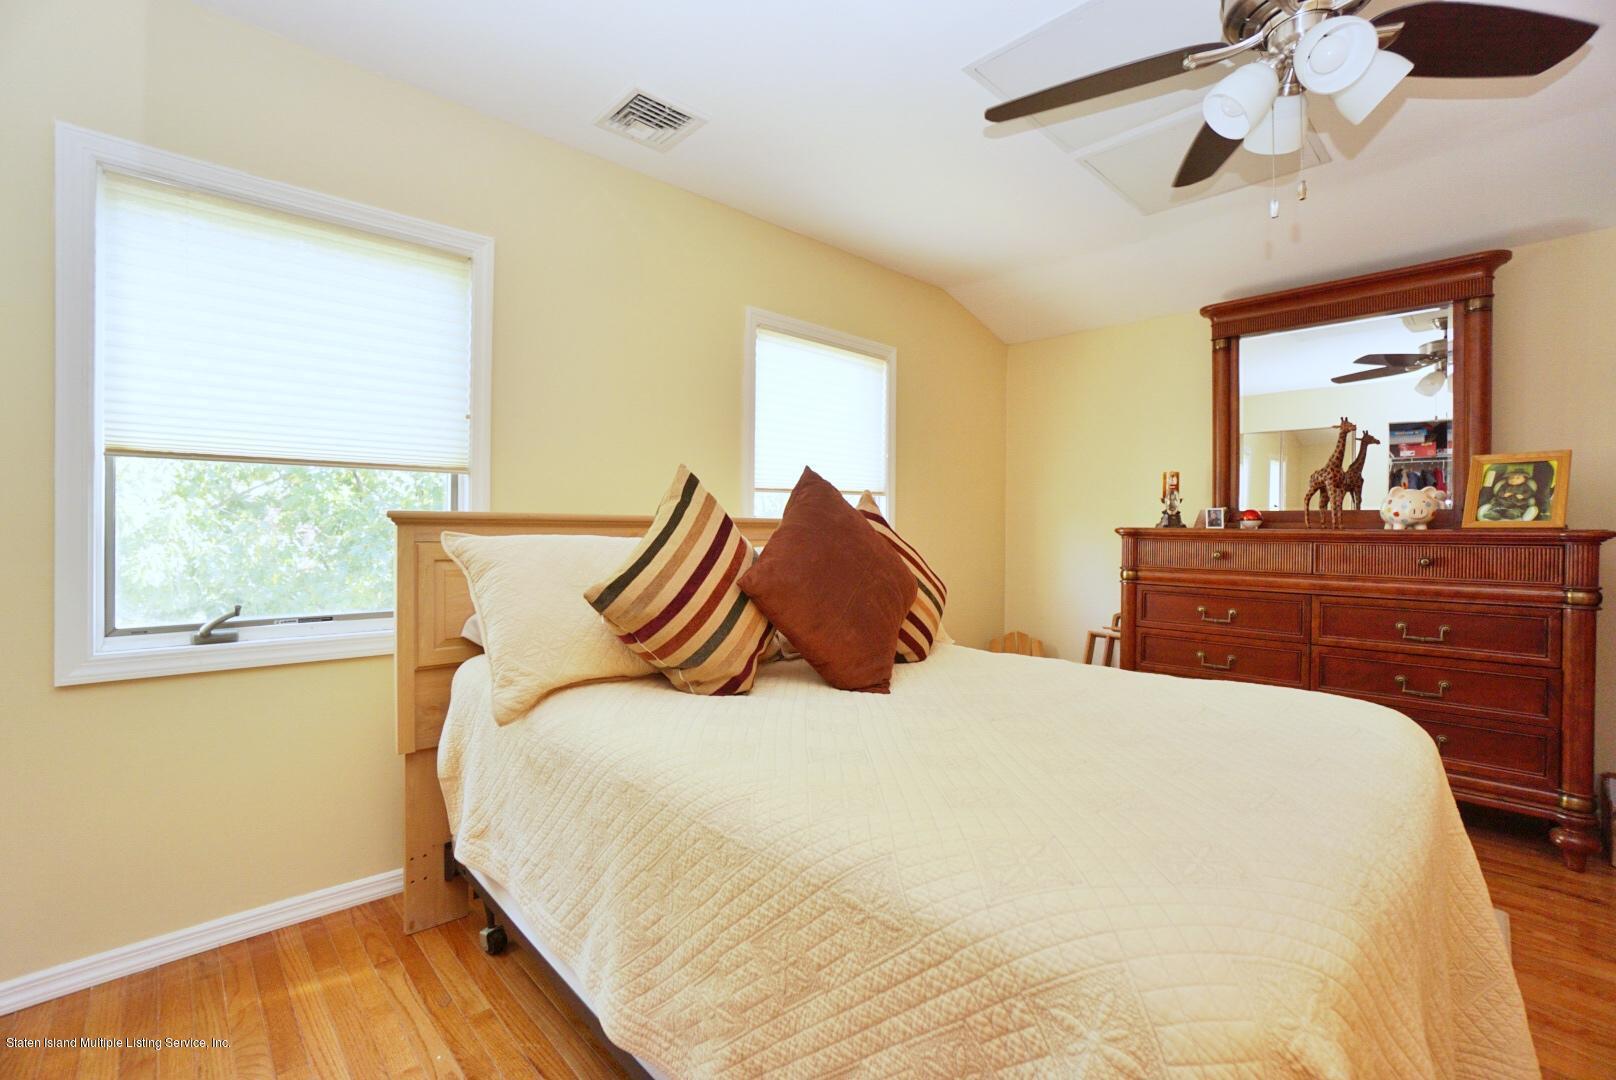 Single Family - Semi-Attached 47 Ilyse Court   Staten Island, NY 10306, MLS-1141335-18